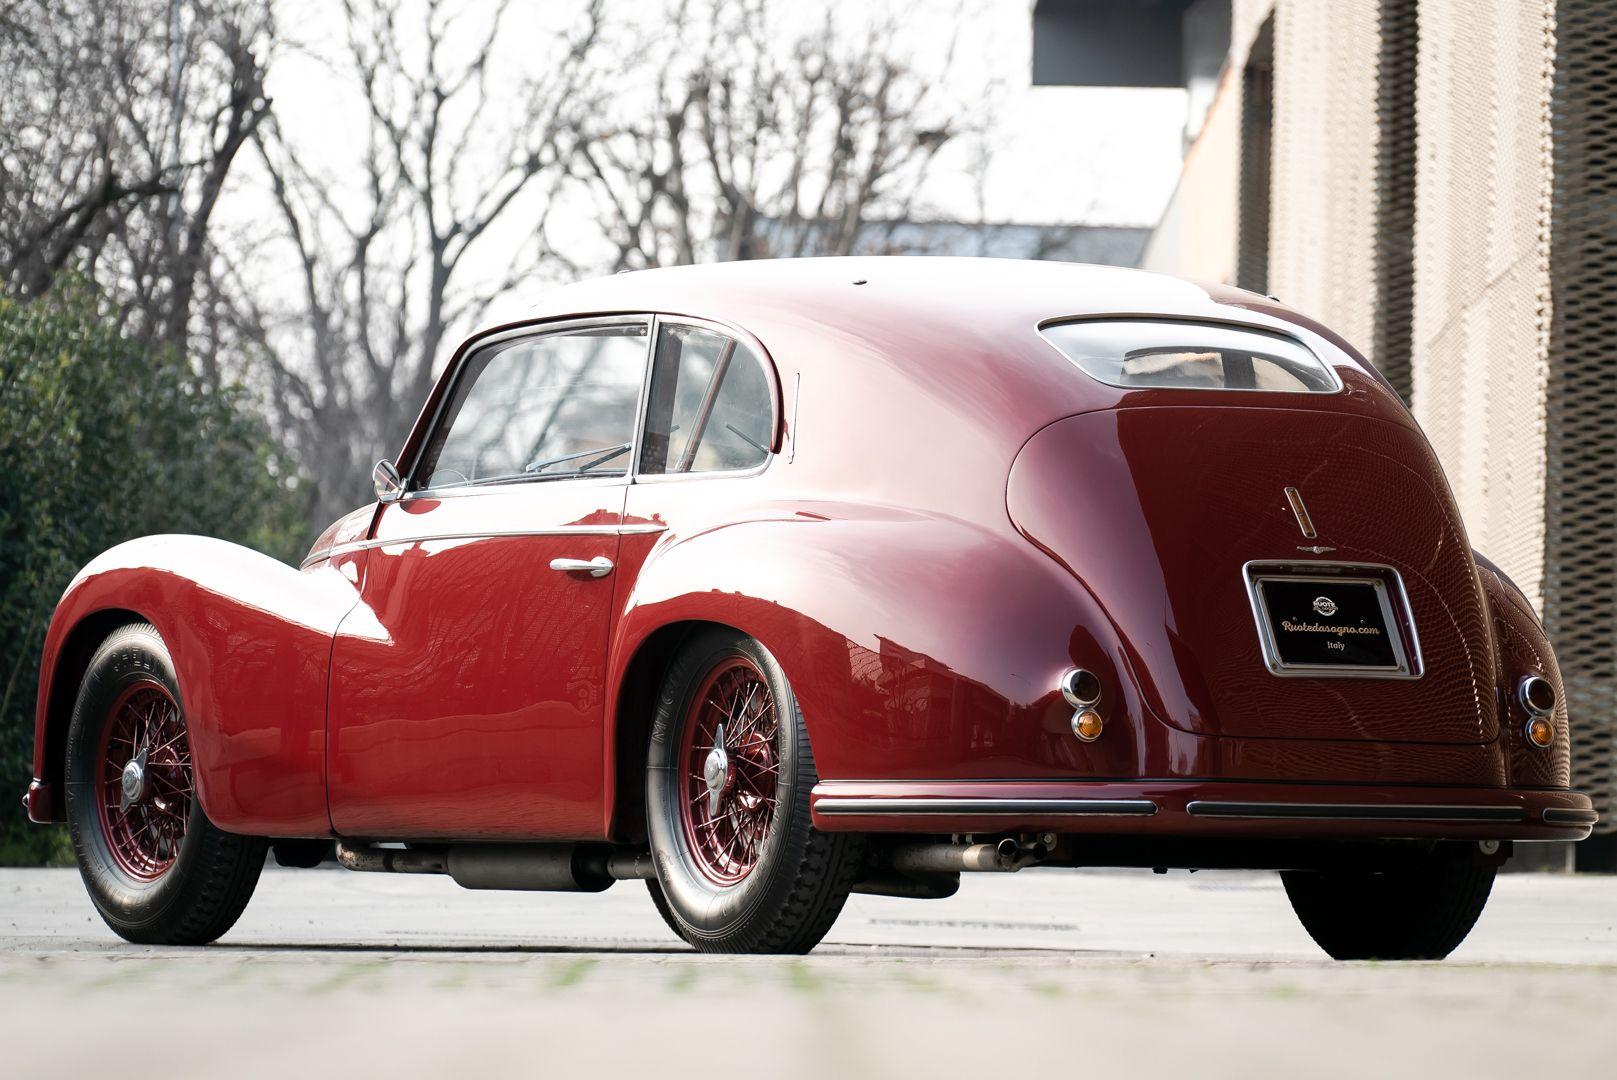 1947 Alfa Romeo Freccia d'oro 6C 2500 Sport 61676